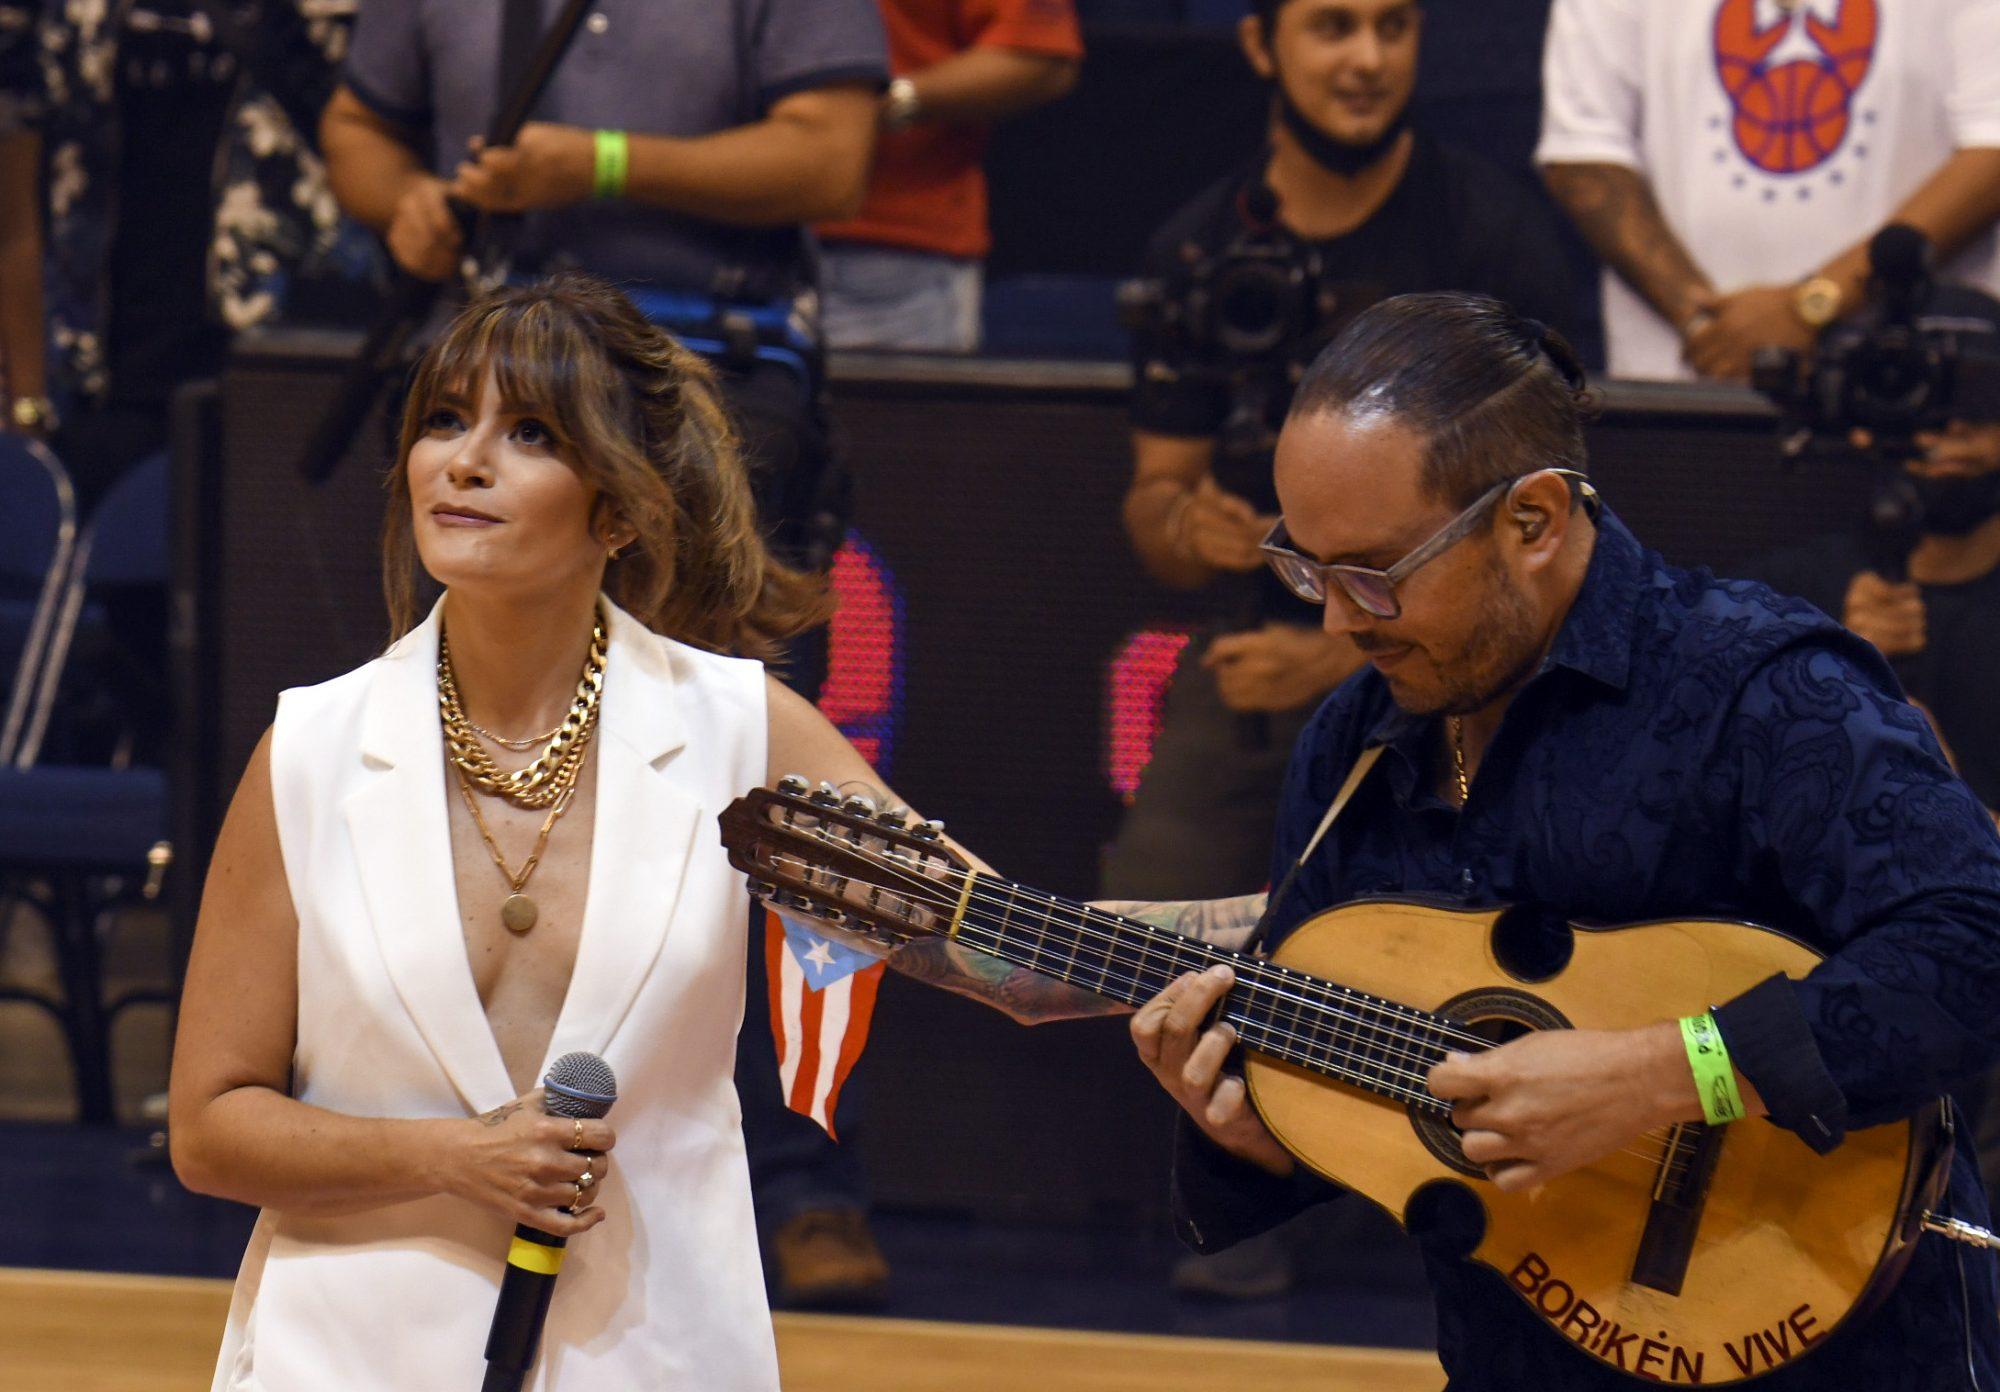 Kany Garcia canta himno de Puerto Rico en un revelador conjunto blanco para un partido de basketball